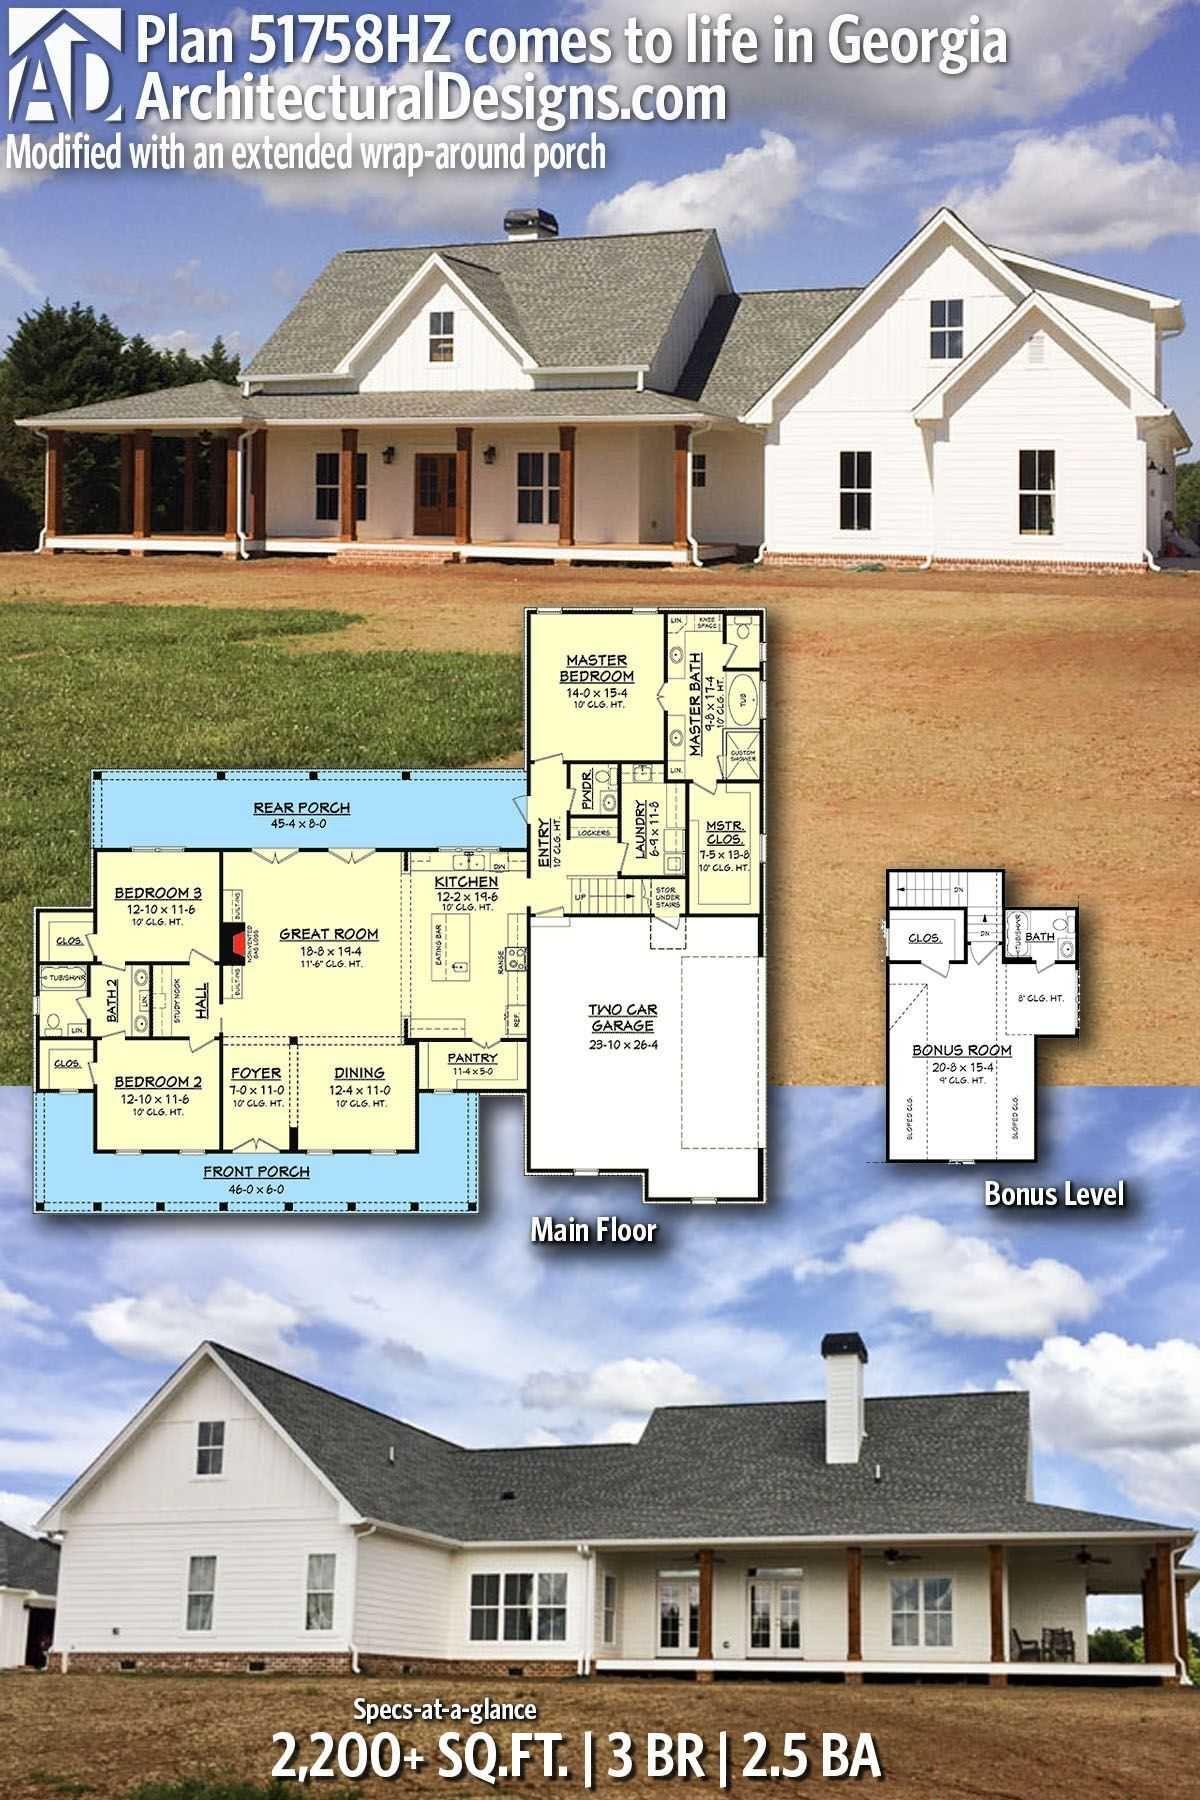 Wrap Around Porch Modern One Story Farmhouse Plans Beautiful Plan Hz Three Bed Farmhouse With Optional Bo New House Plans Farmhouse Floor Plans Farmhouse Plans